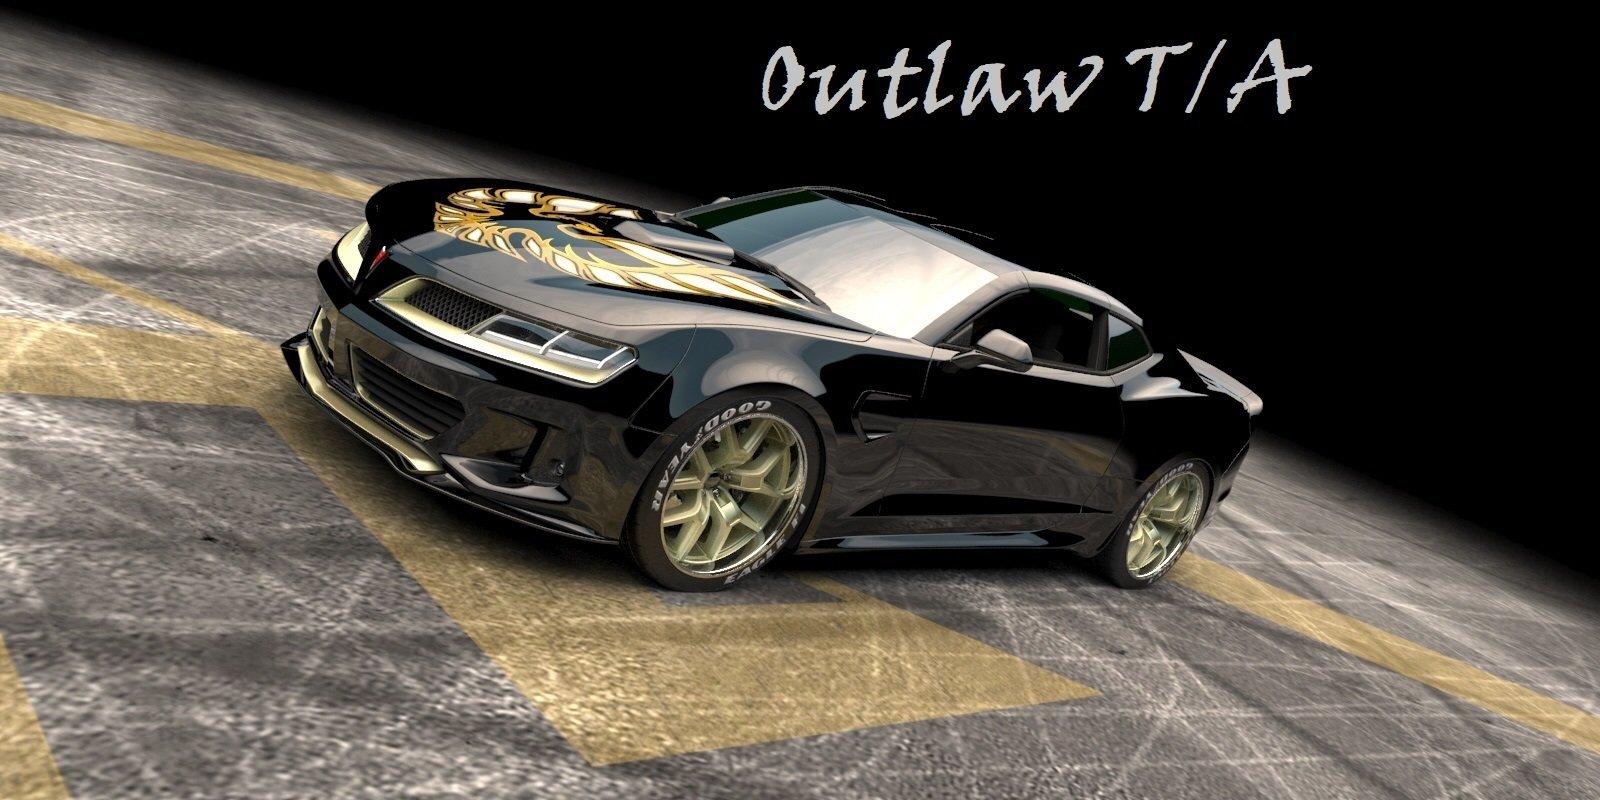 22093e087531d hd 2017 chevrolet camaro outlaw t a